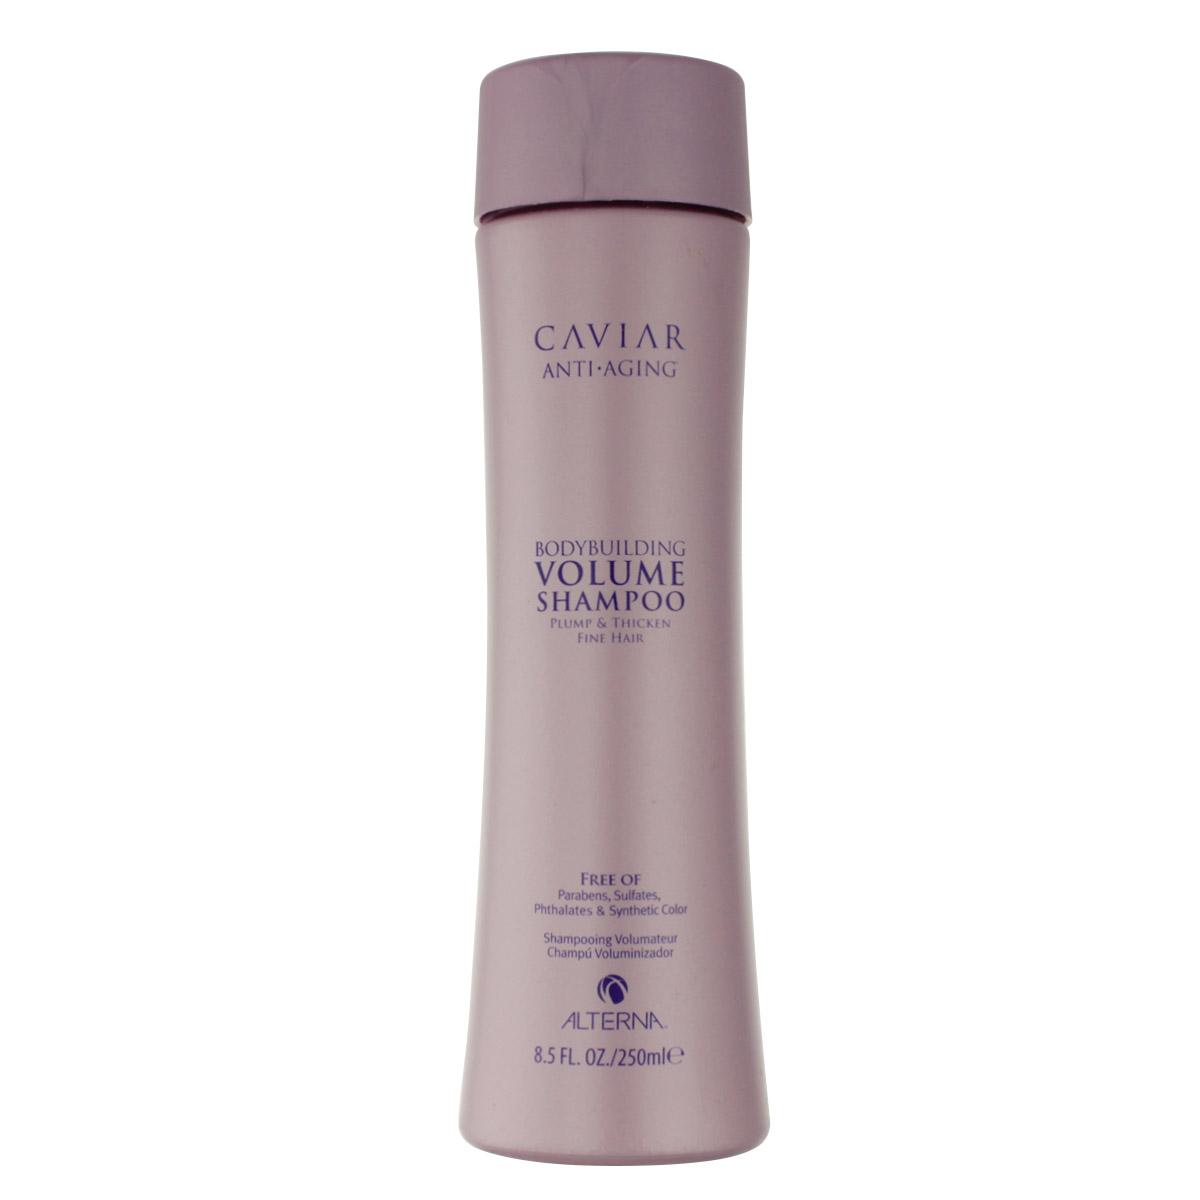 Alterna Caviar Bodybuilding Volume Shampoo 250 ml